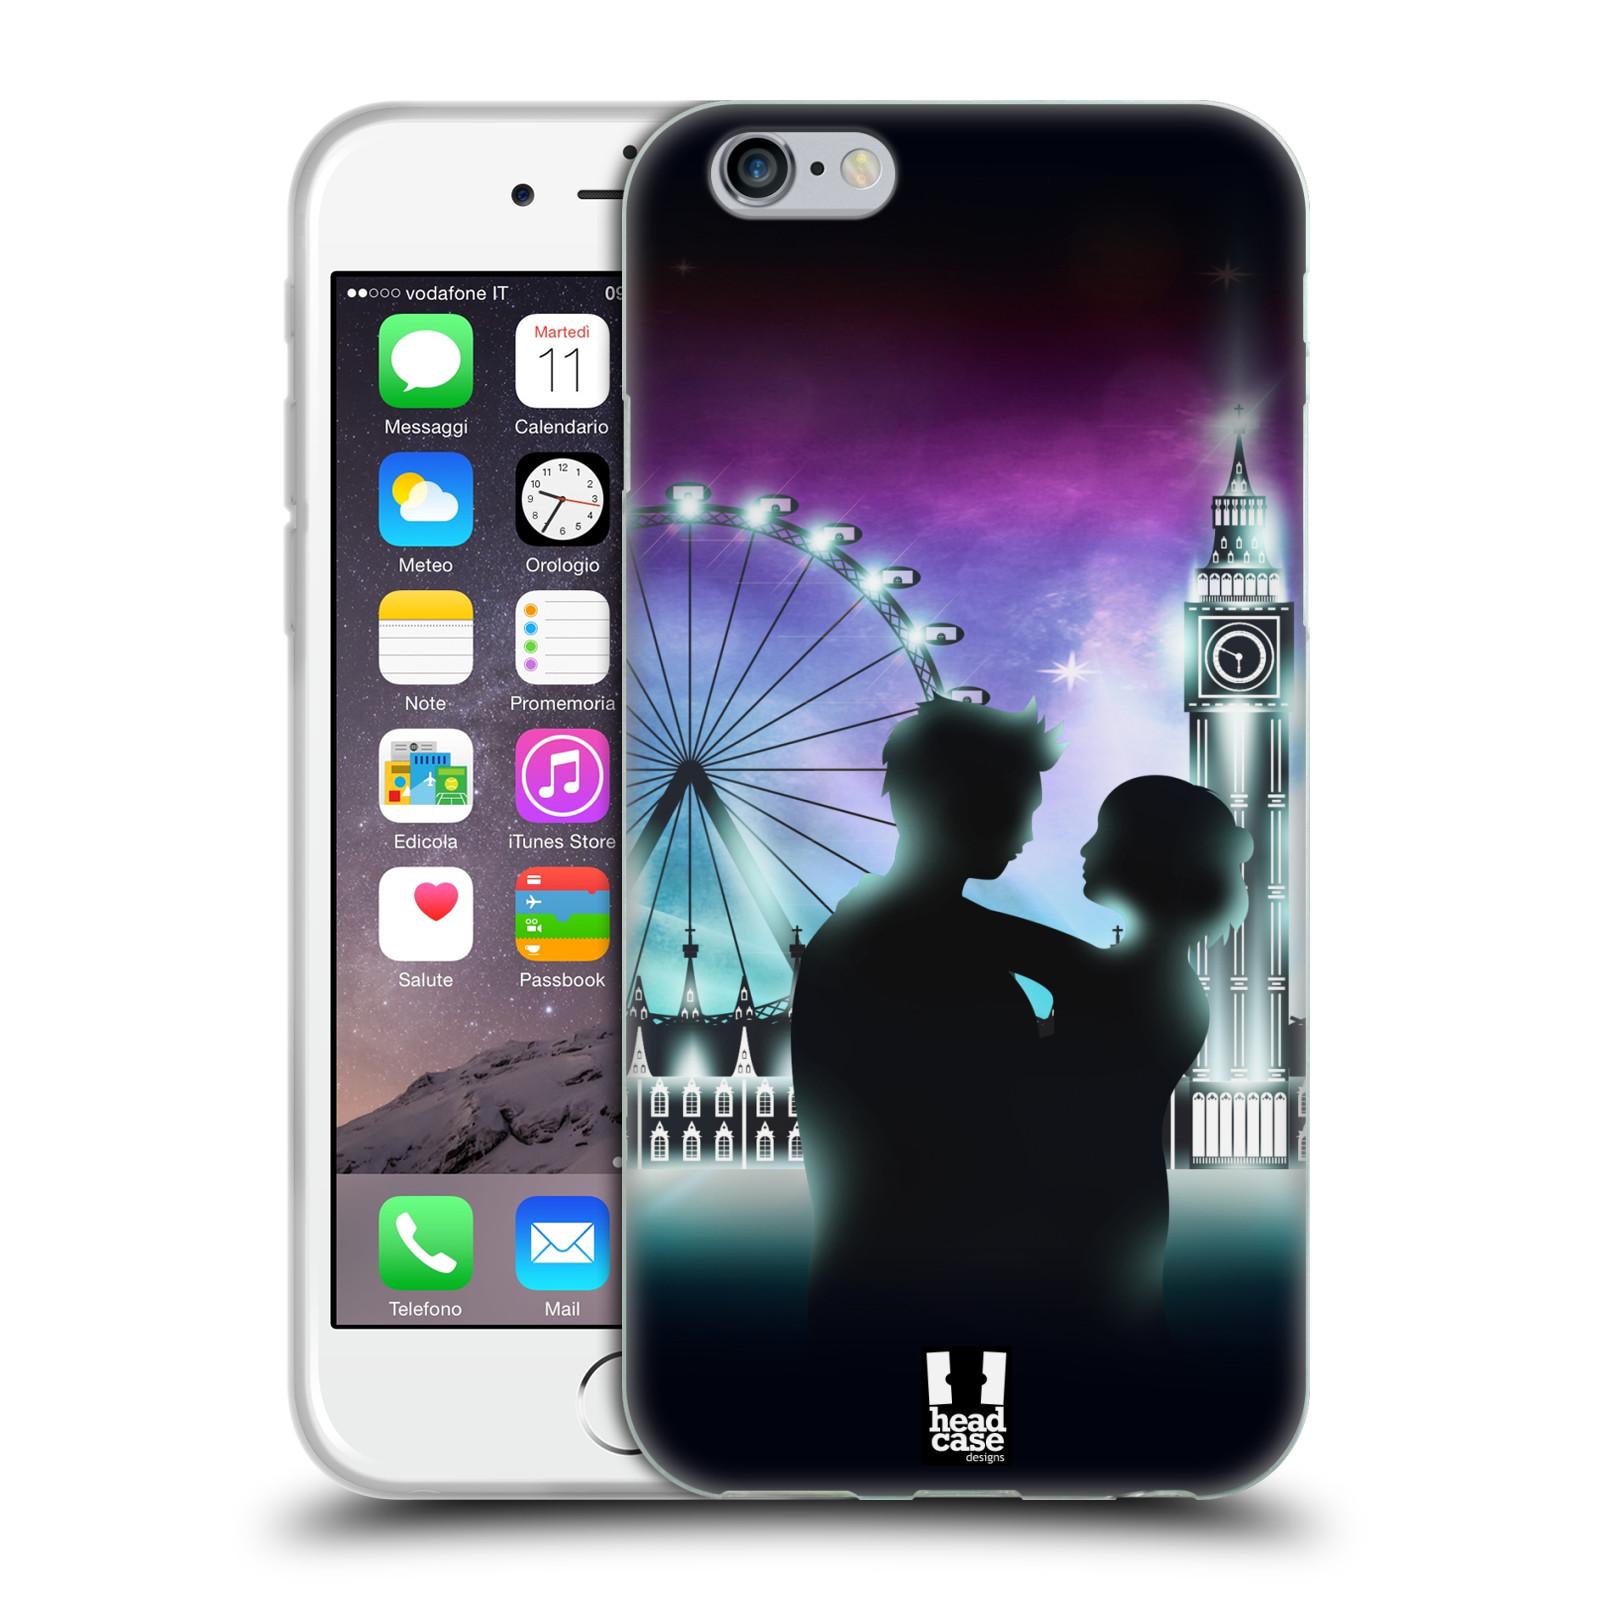 HEAD-CASE-DESIGNS-LOVERS-AVENUE-SOFT-GEL-CASE-FOR-APPLE-iPHONE-PHONES